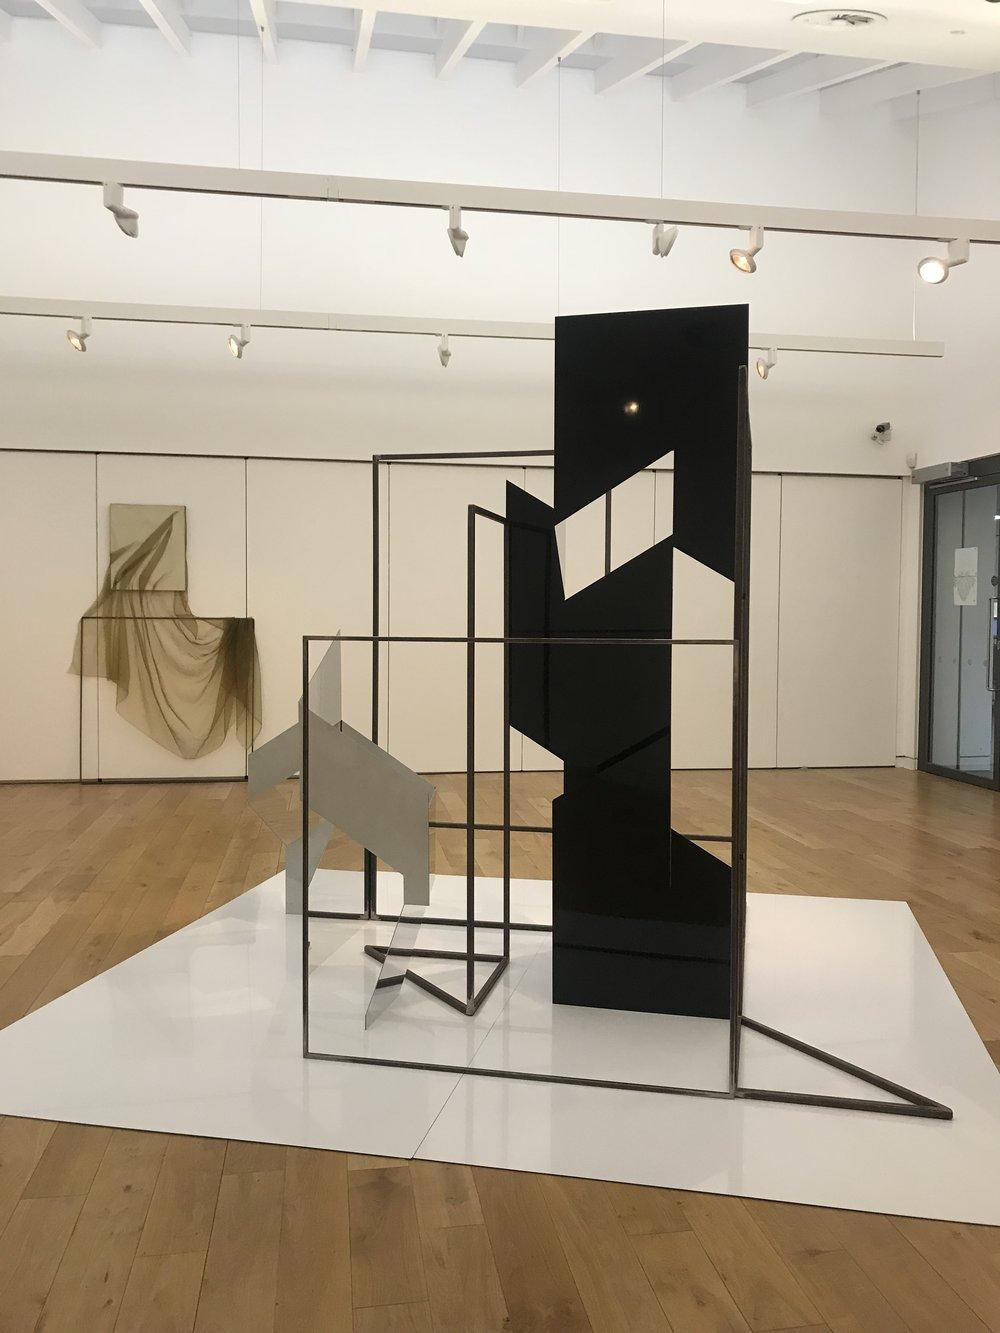 Border Controls. Rosalind Davis and Justin Hibbs Installation Shots at the Sevenoaks Kaleidoscope Gallery 2018. Photo 06-11-2018, 15 42 18.jpg